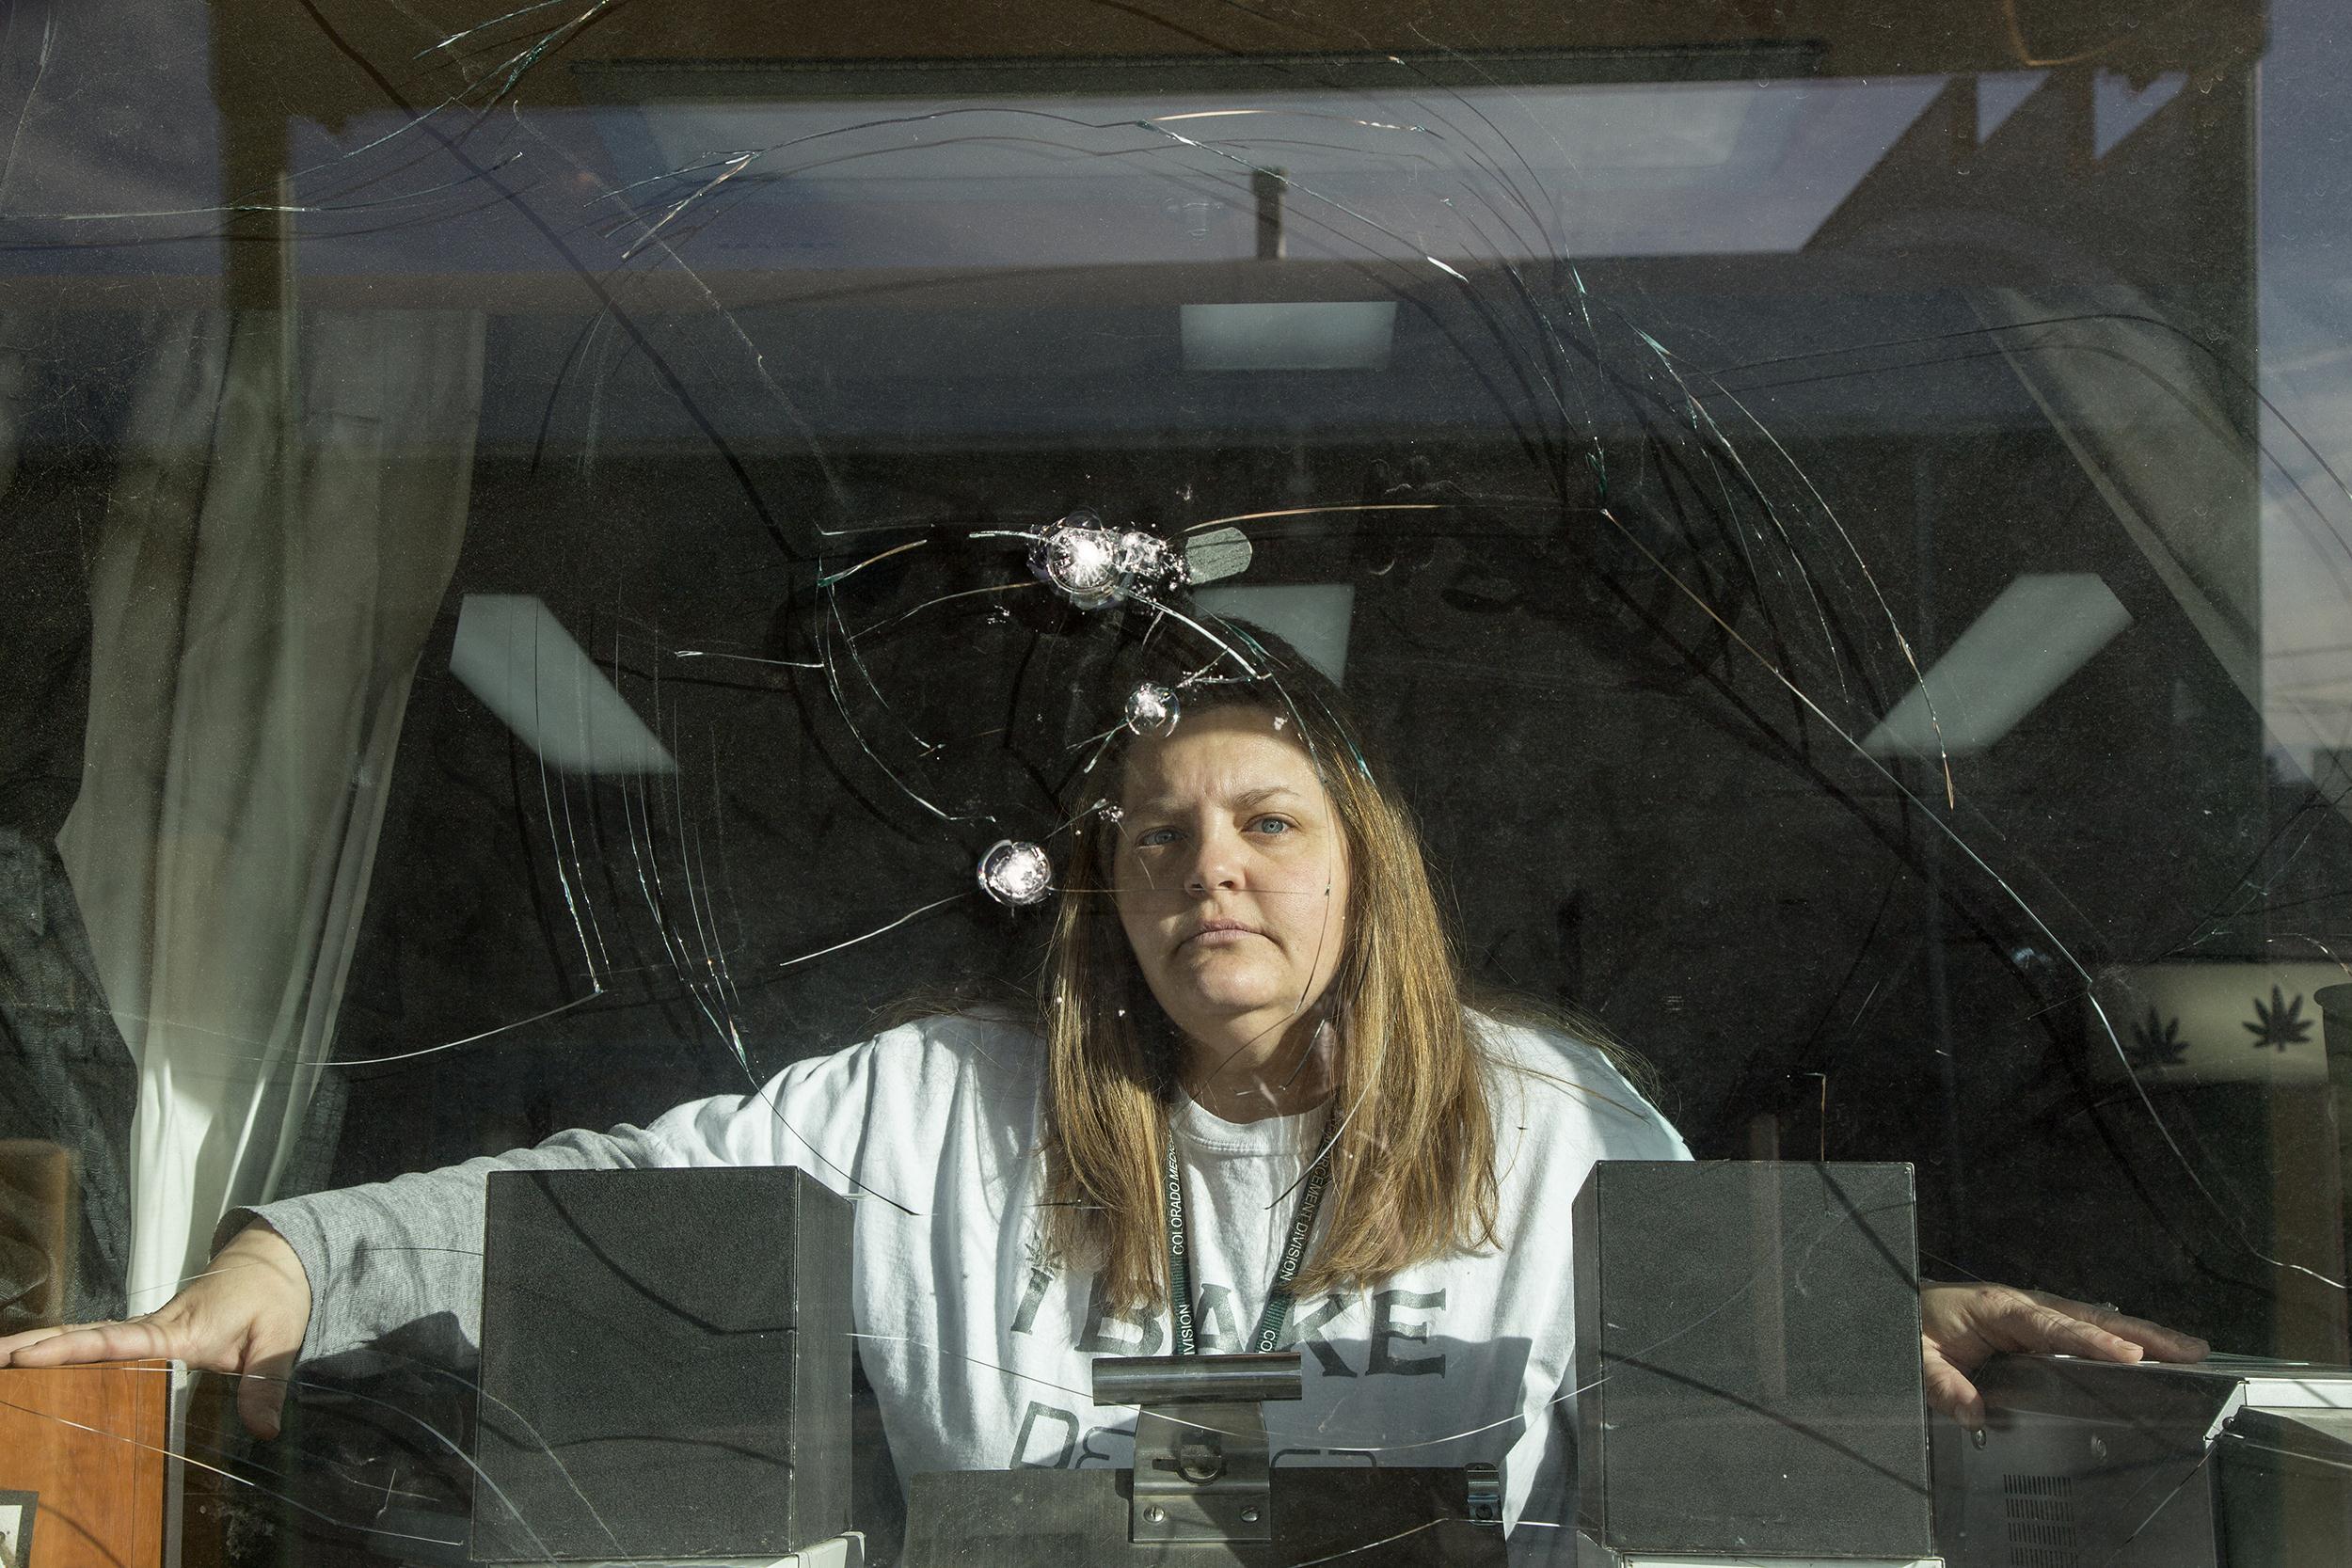 Image: Yevette Wiliams had her marijuana dispenary burlarized